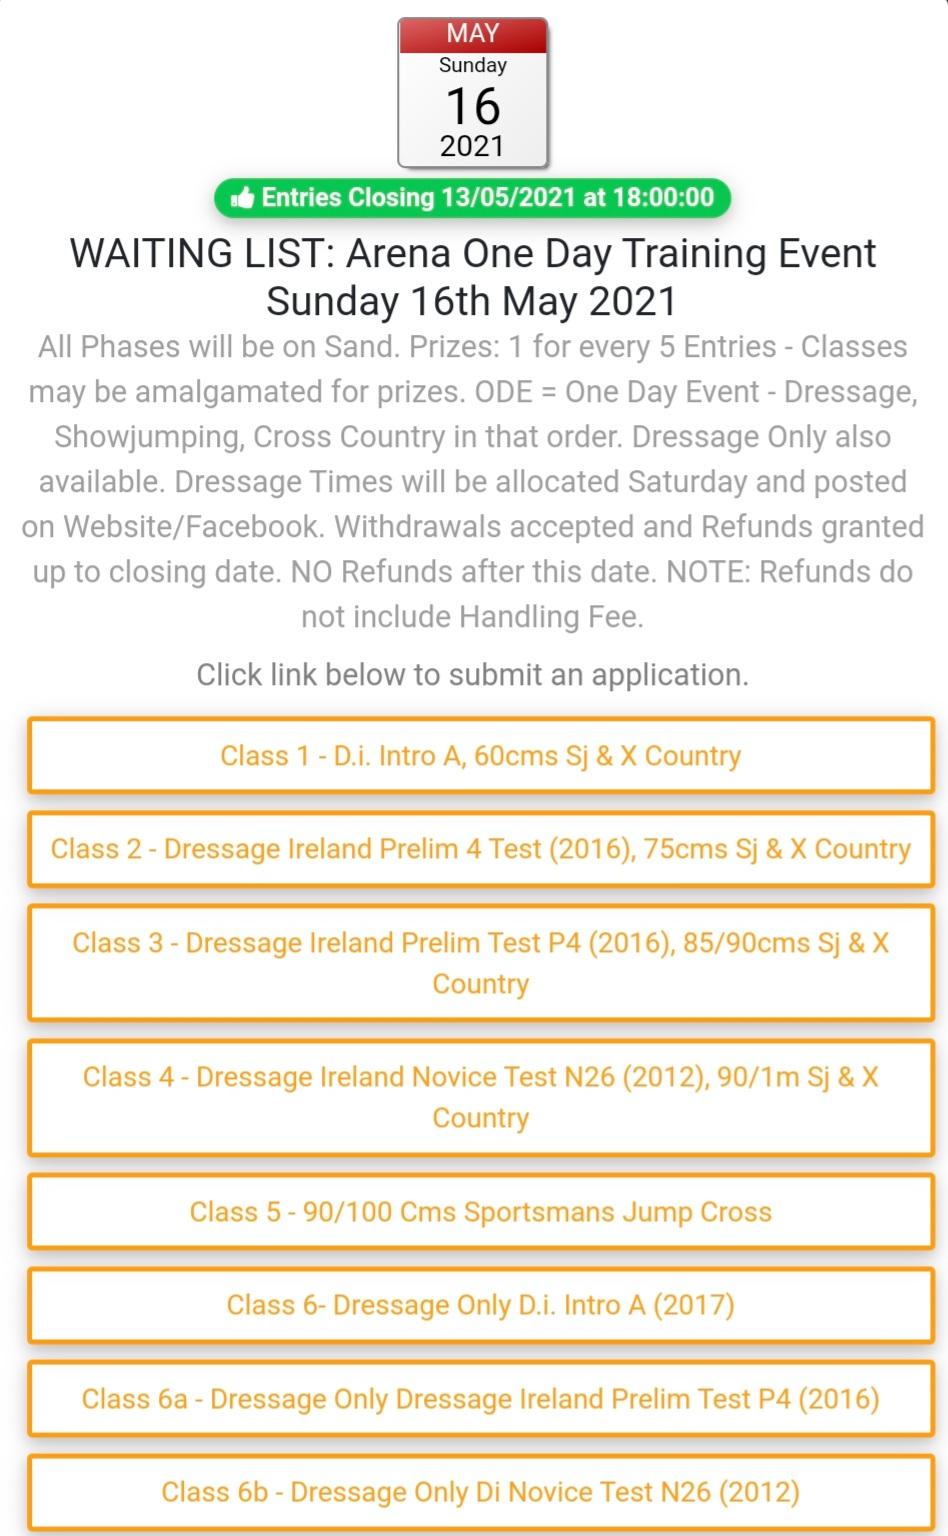 One Day Event at Claremorris Eq Centre